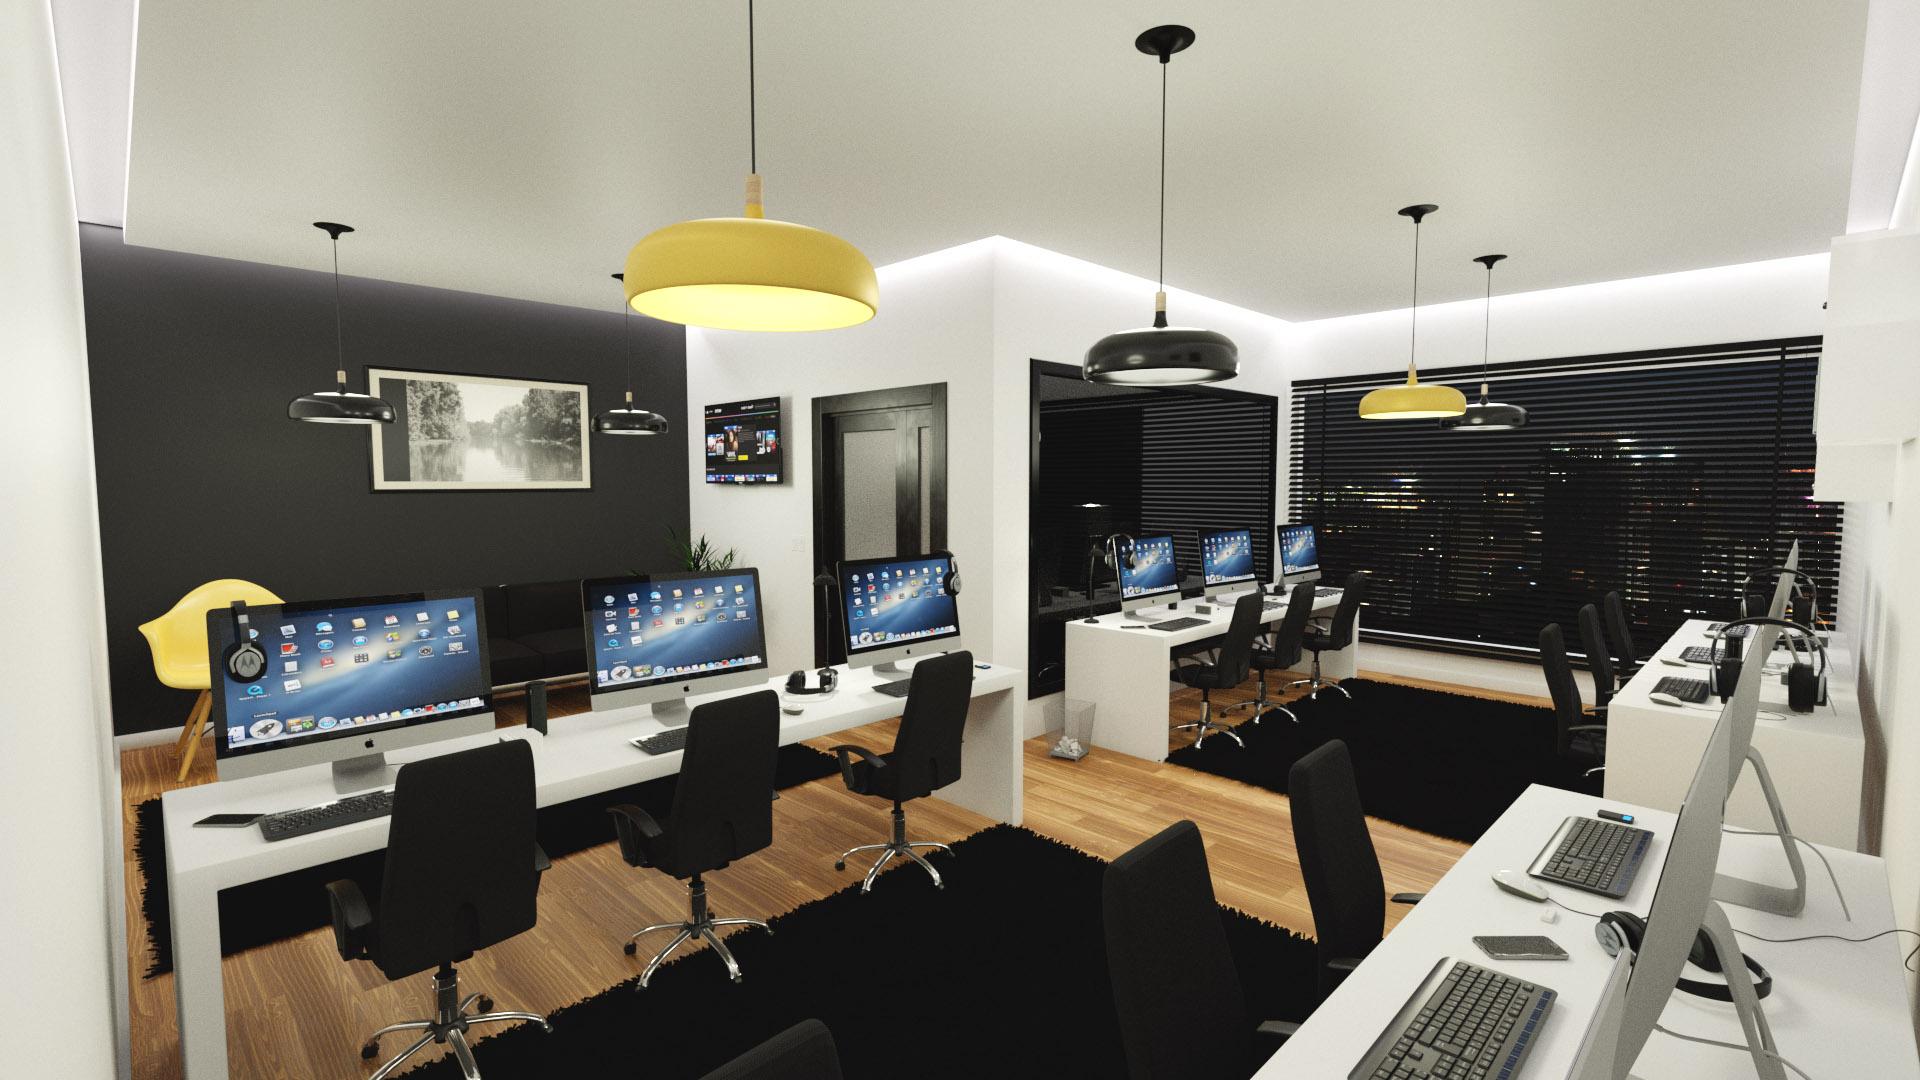 projeto-render-realista-interior-escritorio-perspectiva